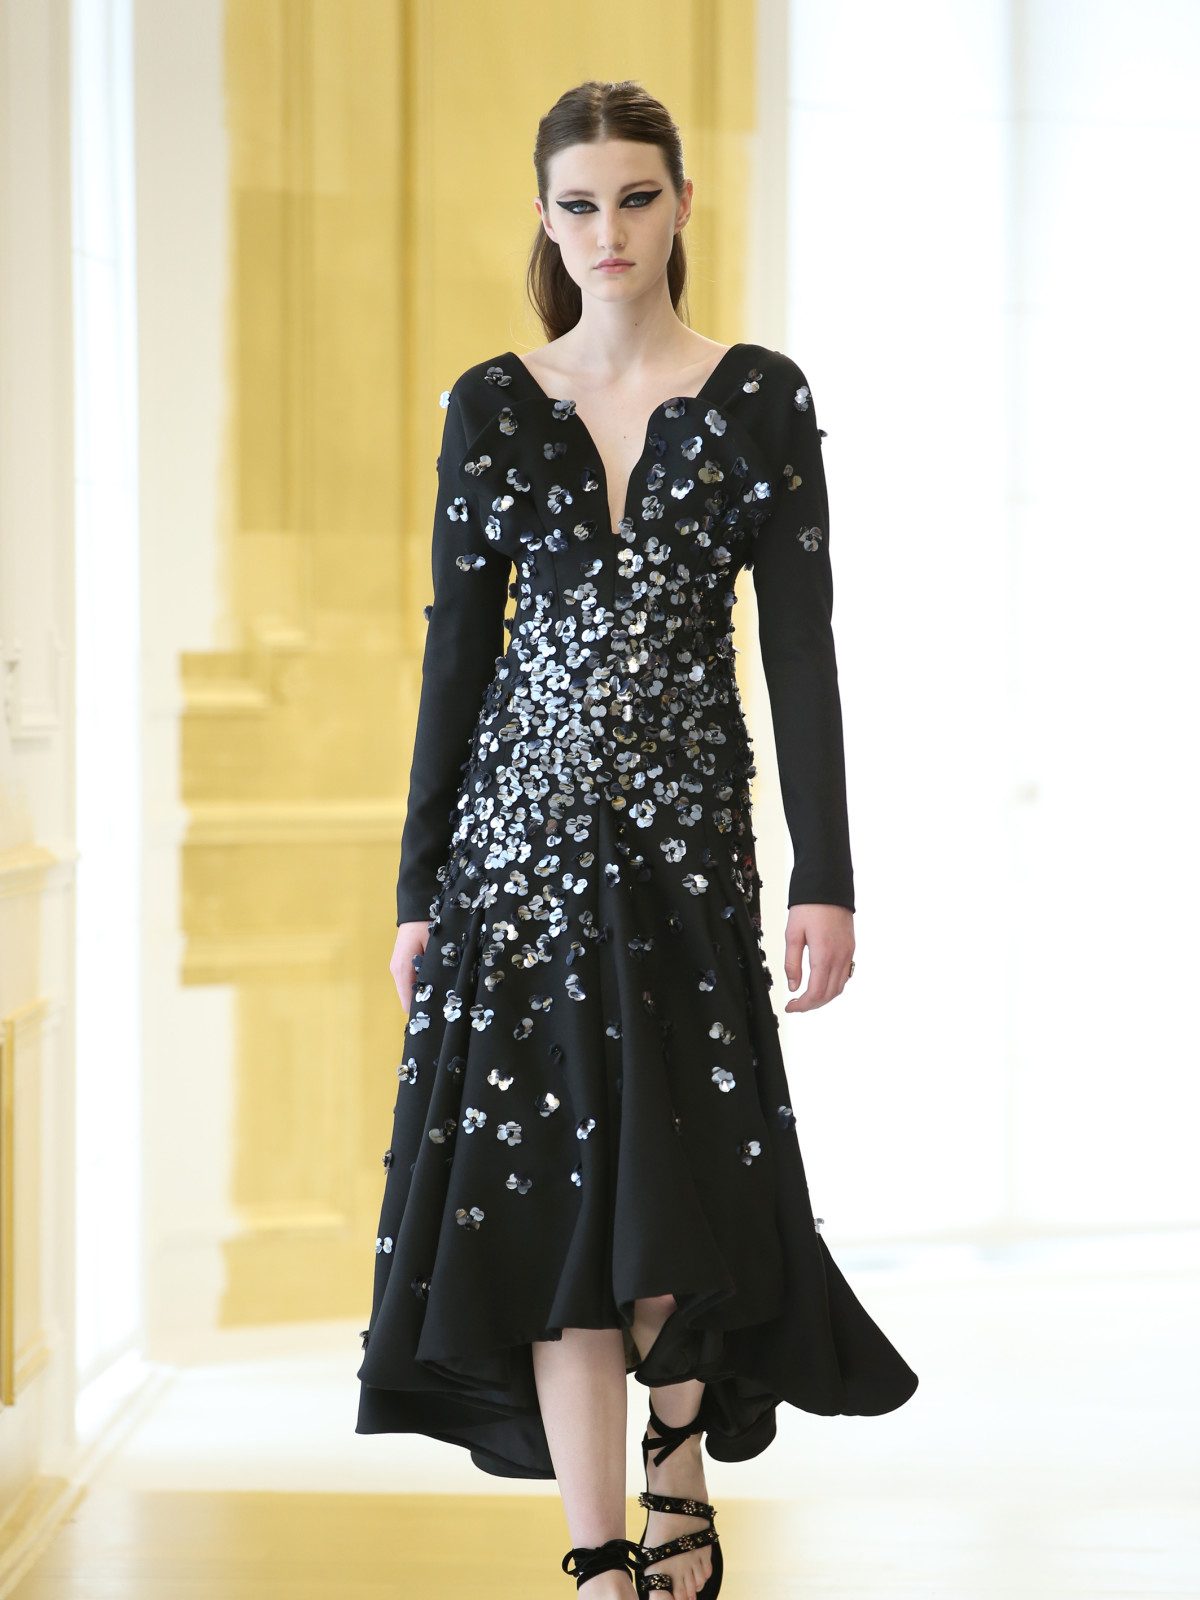 Dior haute couture runway show Paris finale look 39